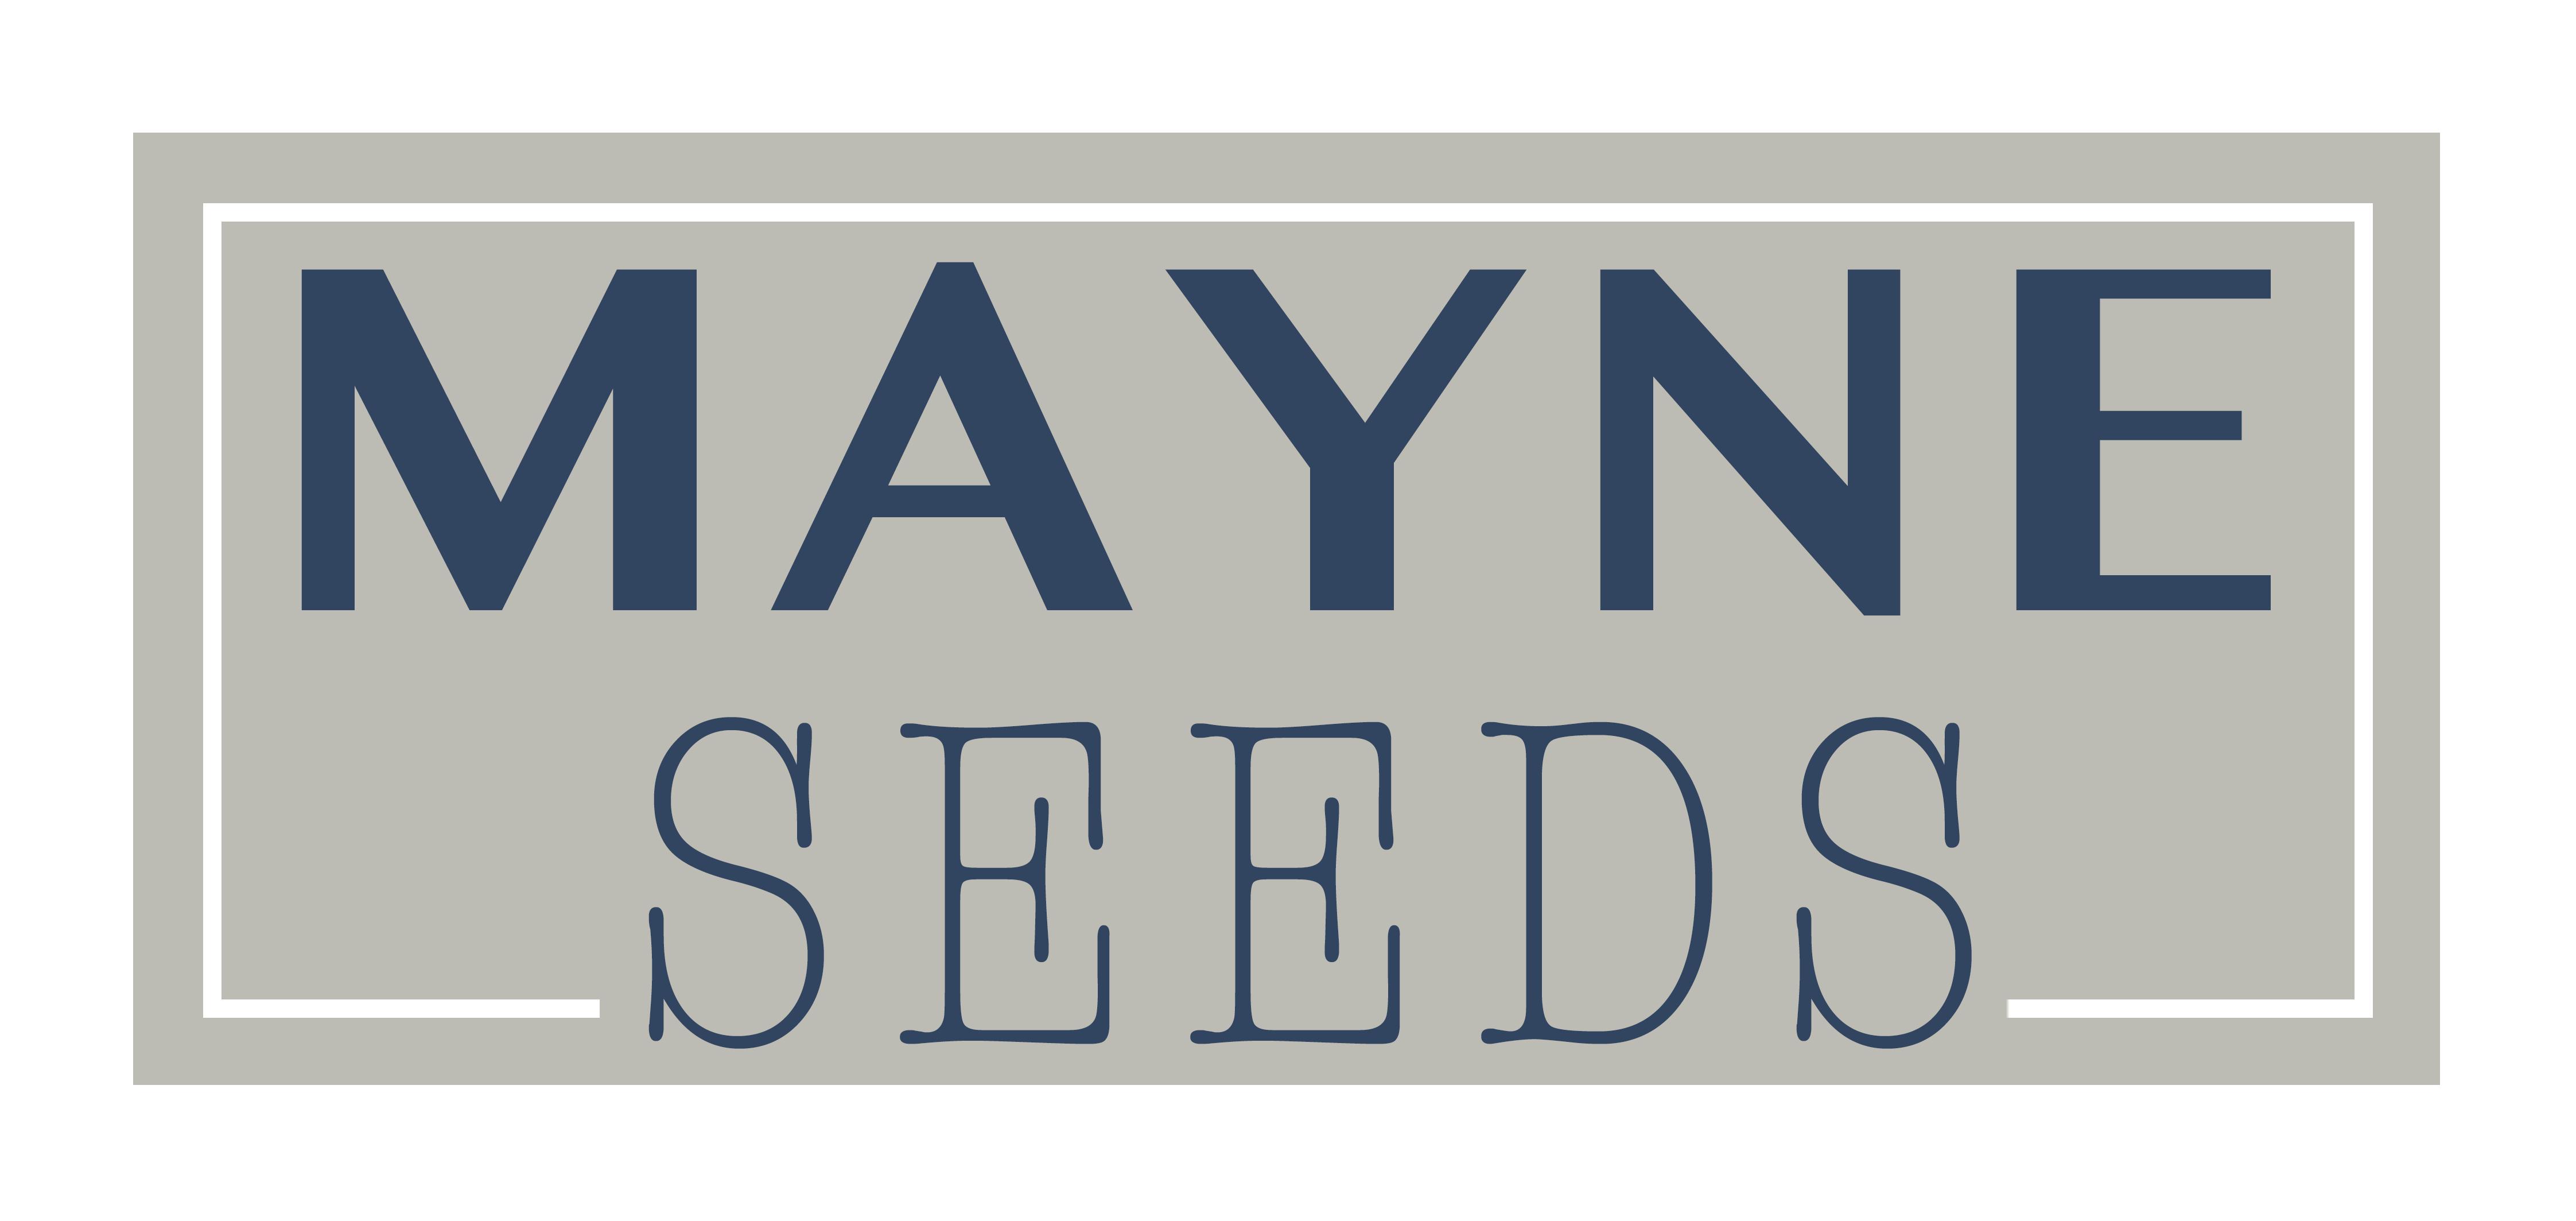 Mayne Seeds Coloured Rect